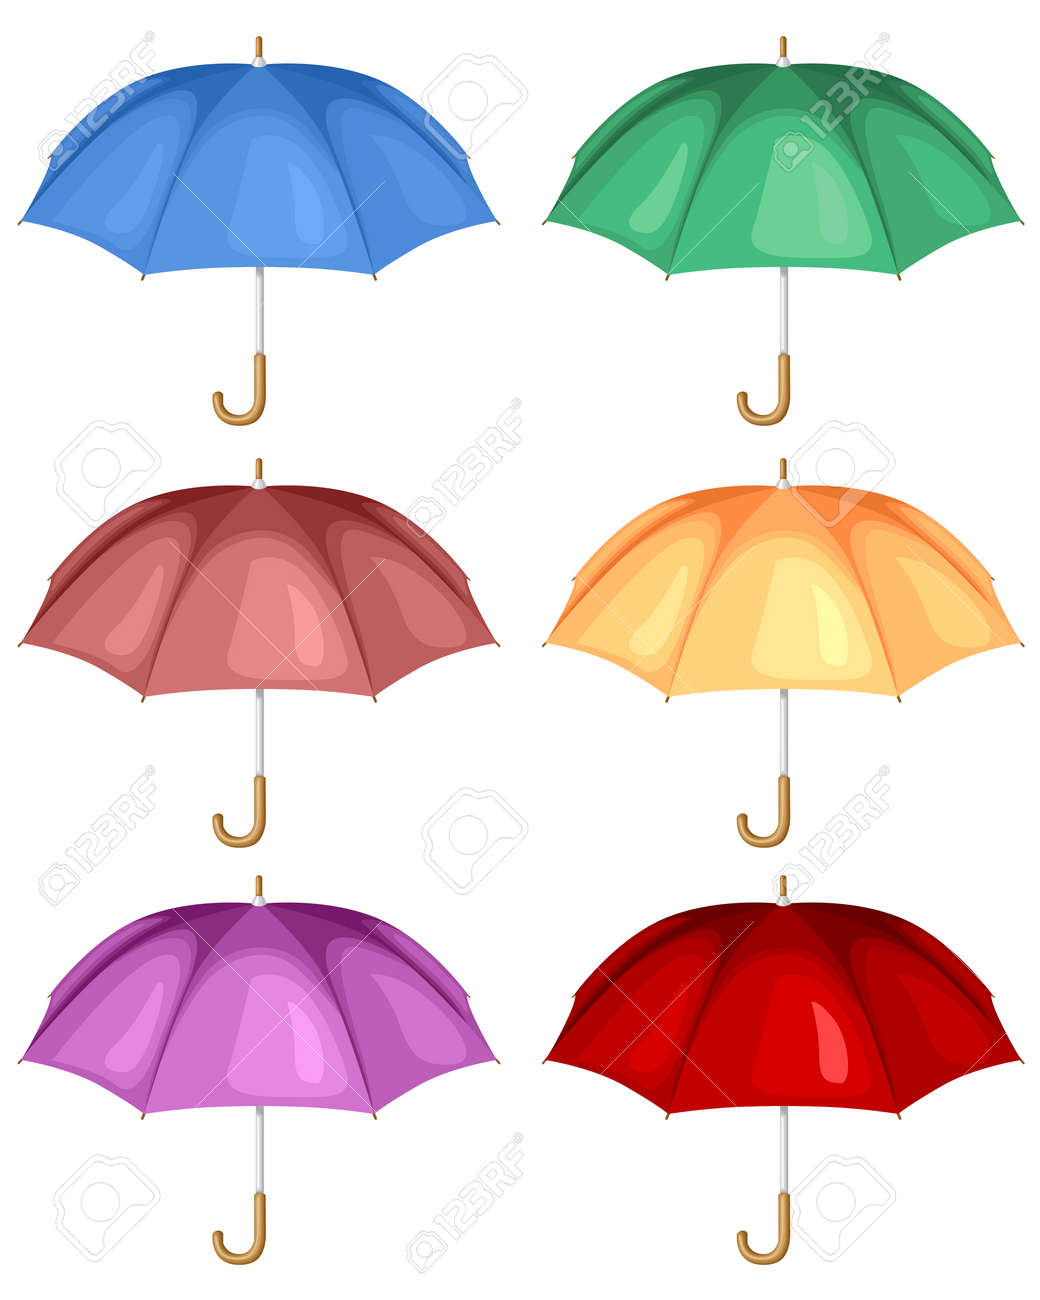 colorful cartoon umbrellas set royalty free cliparts vectors and